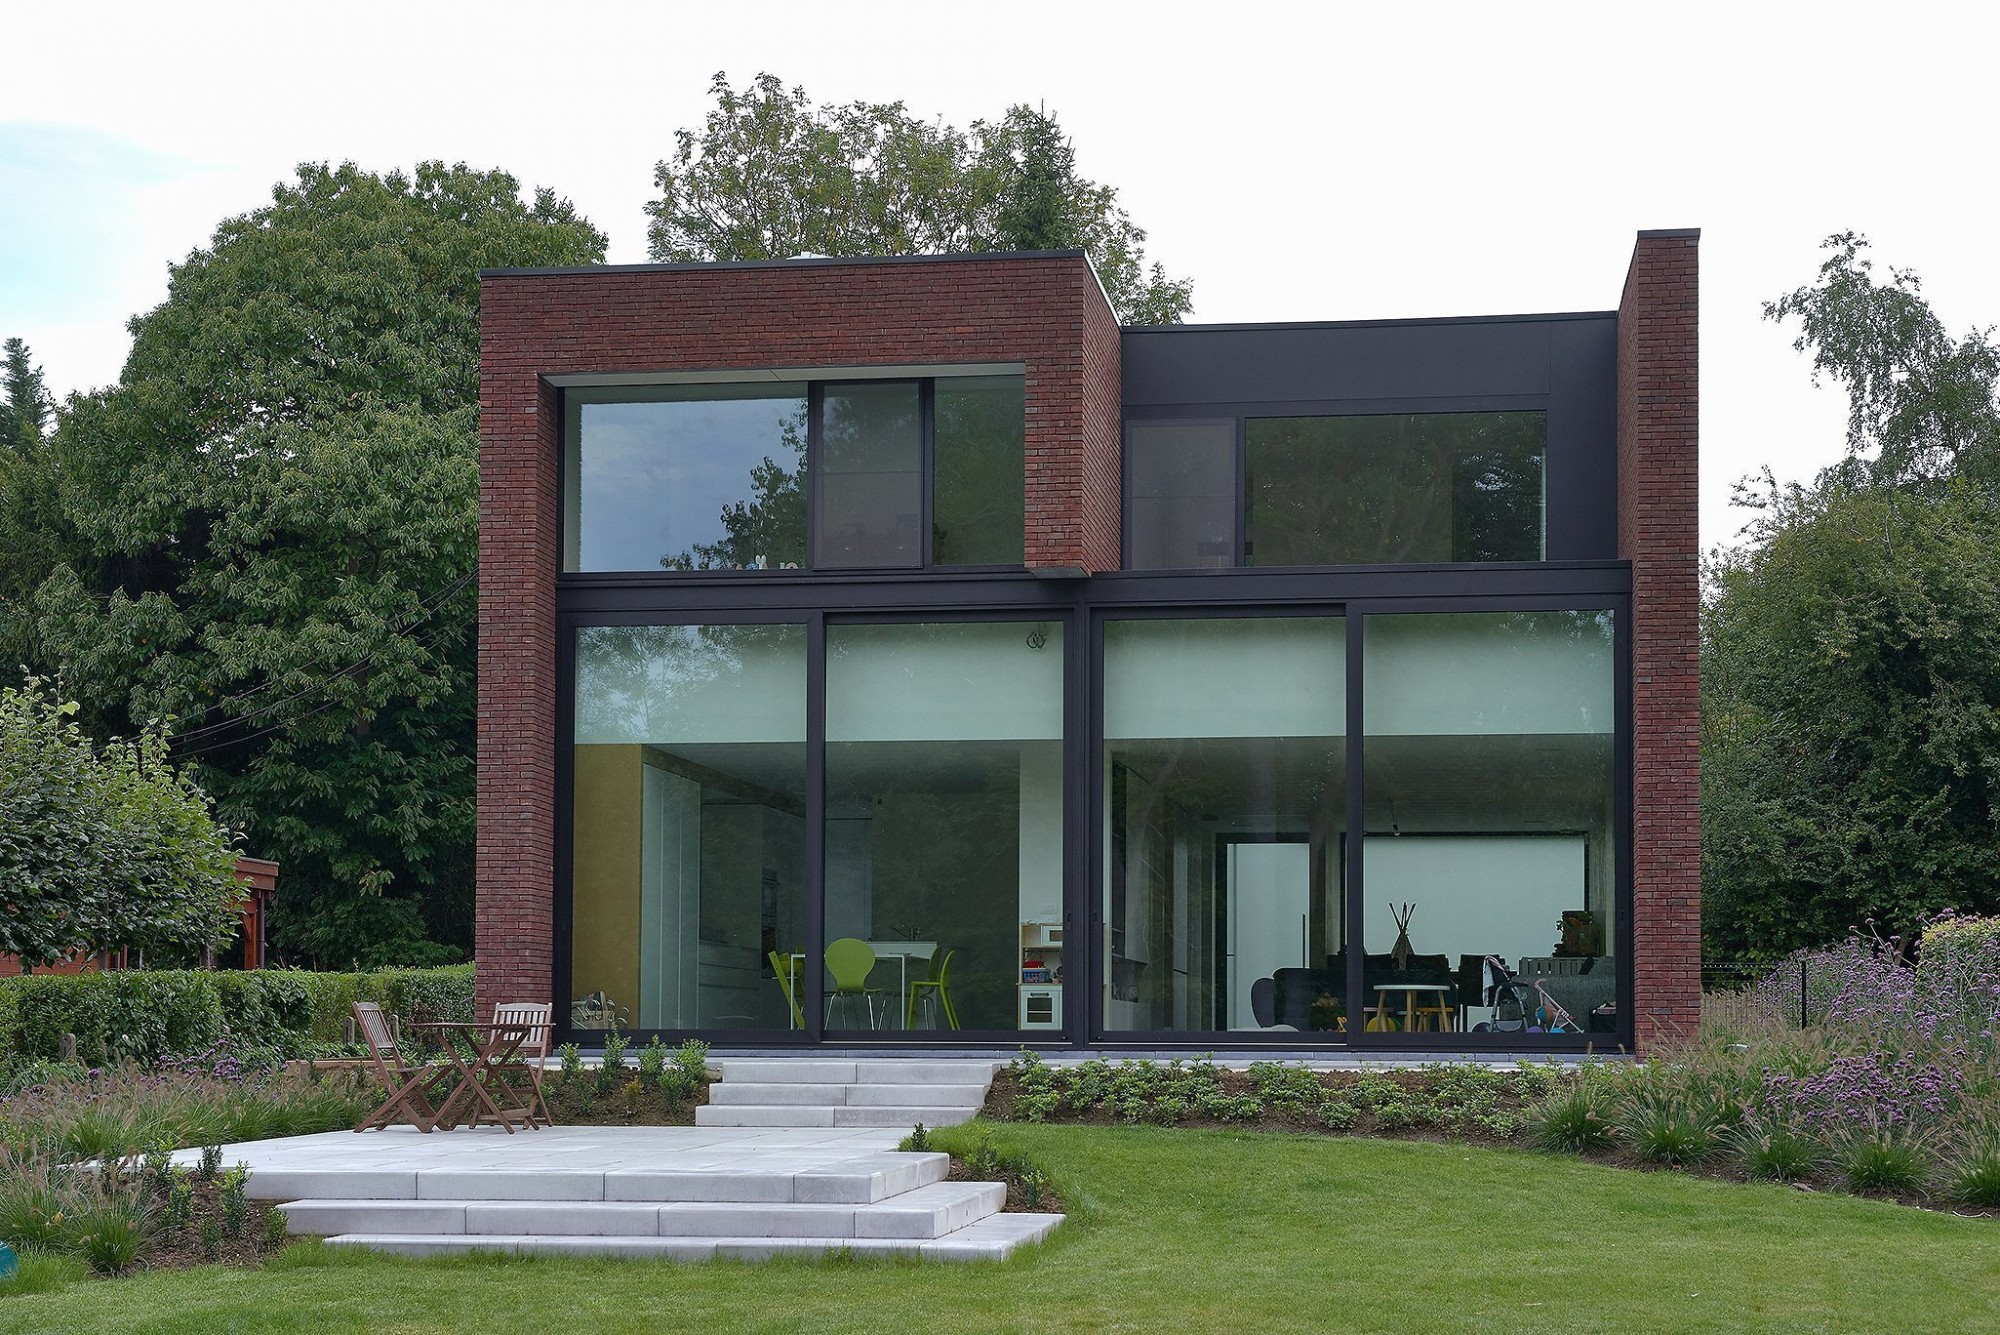 Afbeelding: Architectuur fotografie, moderne woning met terras, voor Stone&Style.